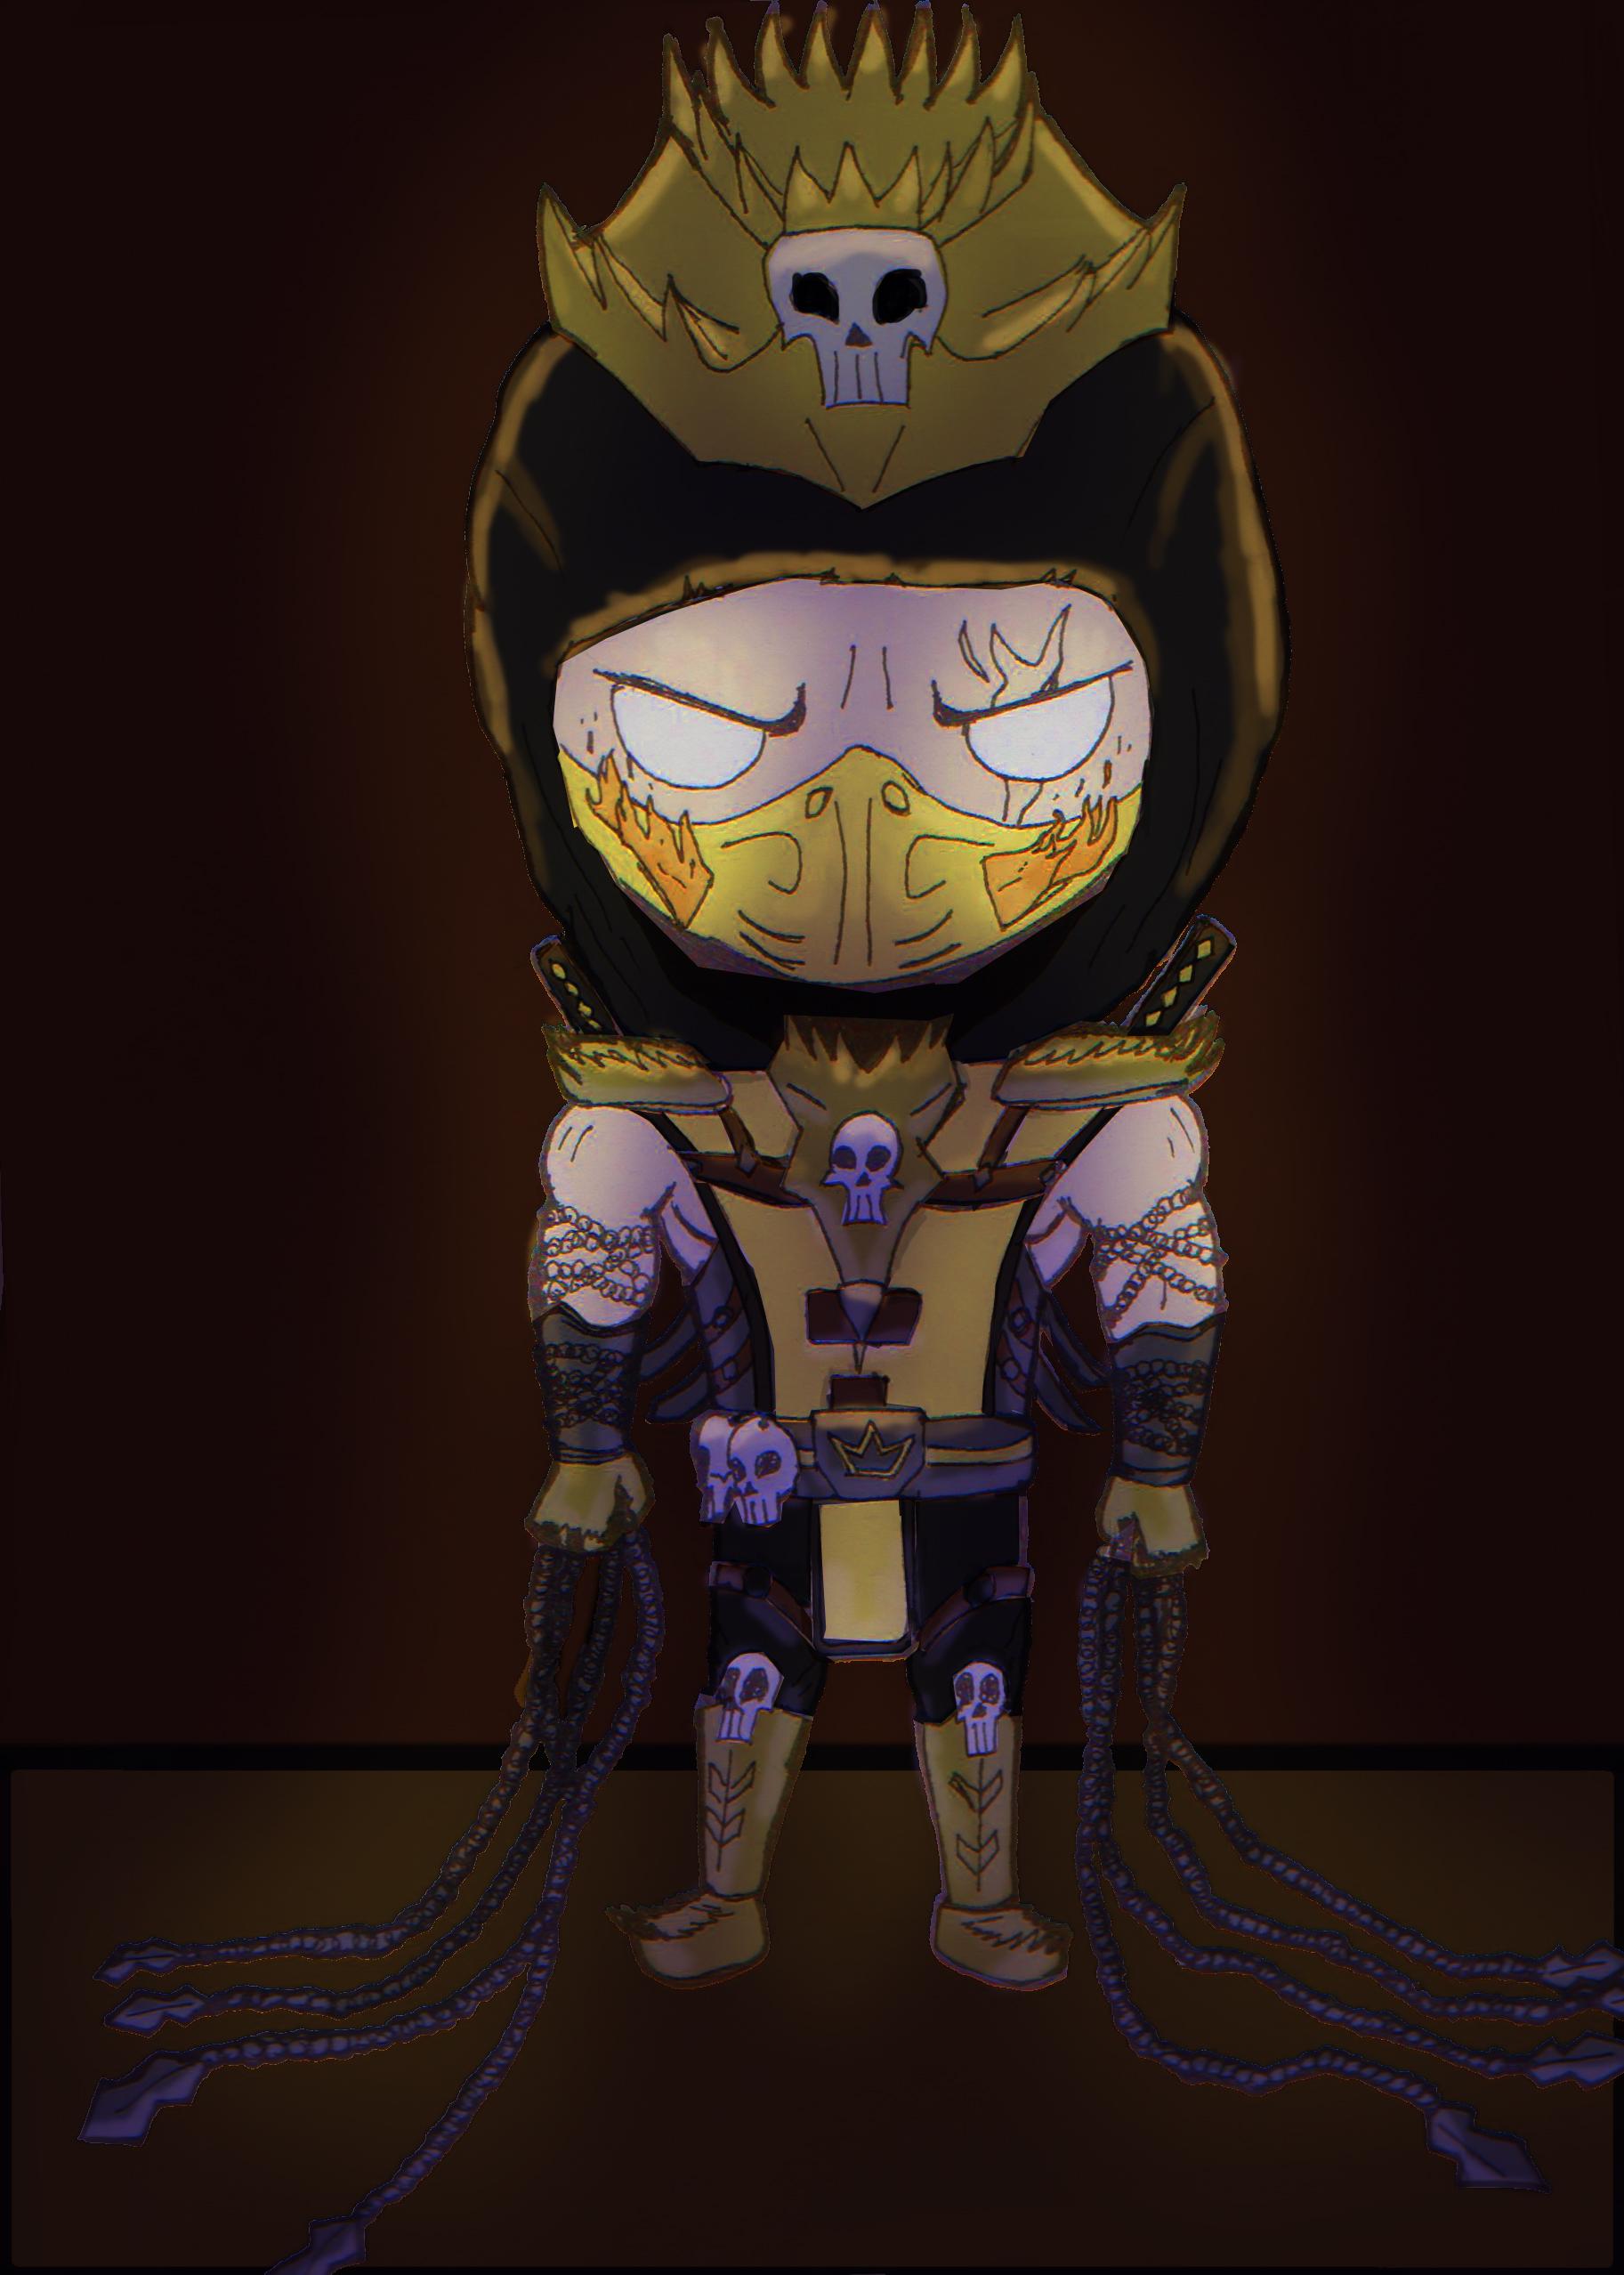 Scorpion LVL99 The King of Mortal Kombat